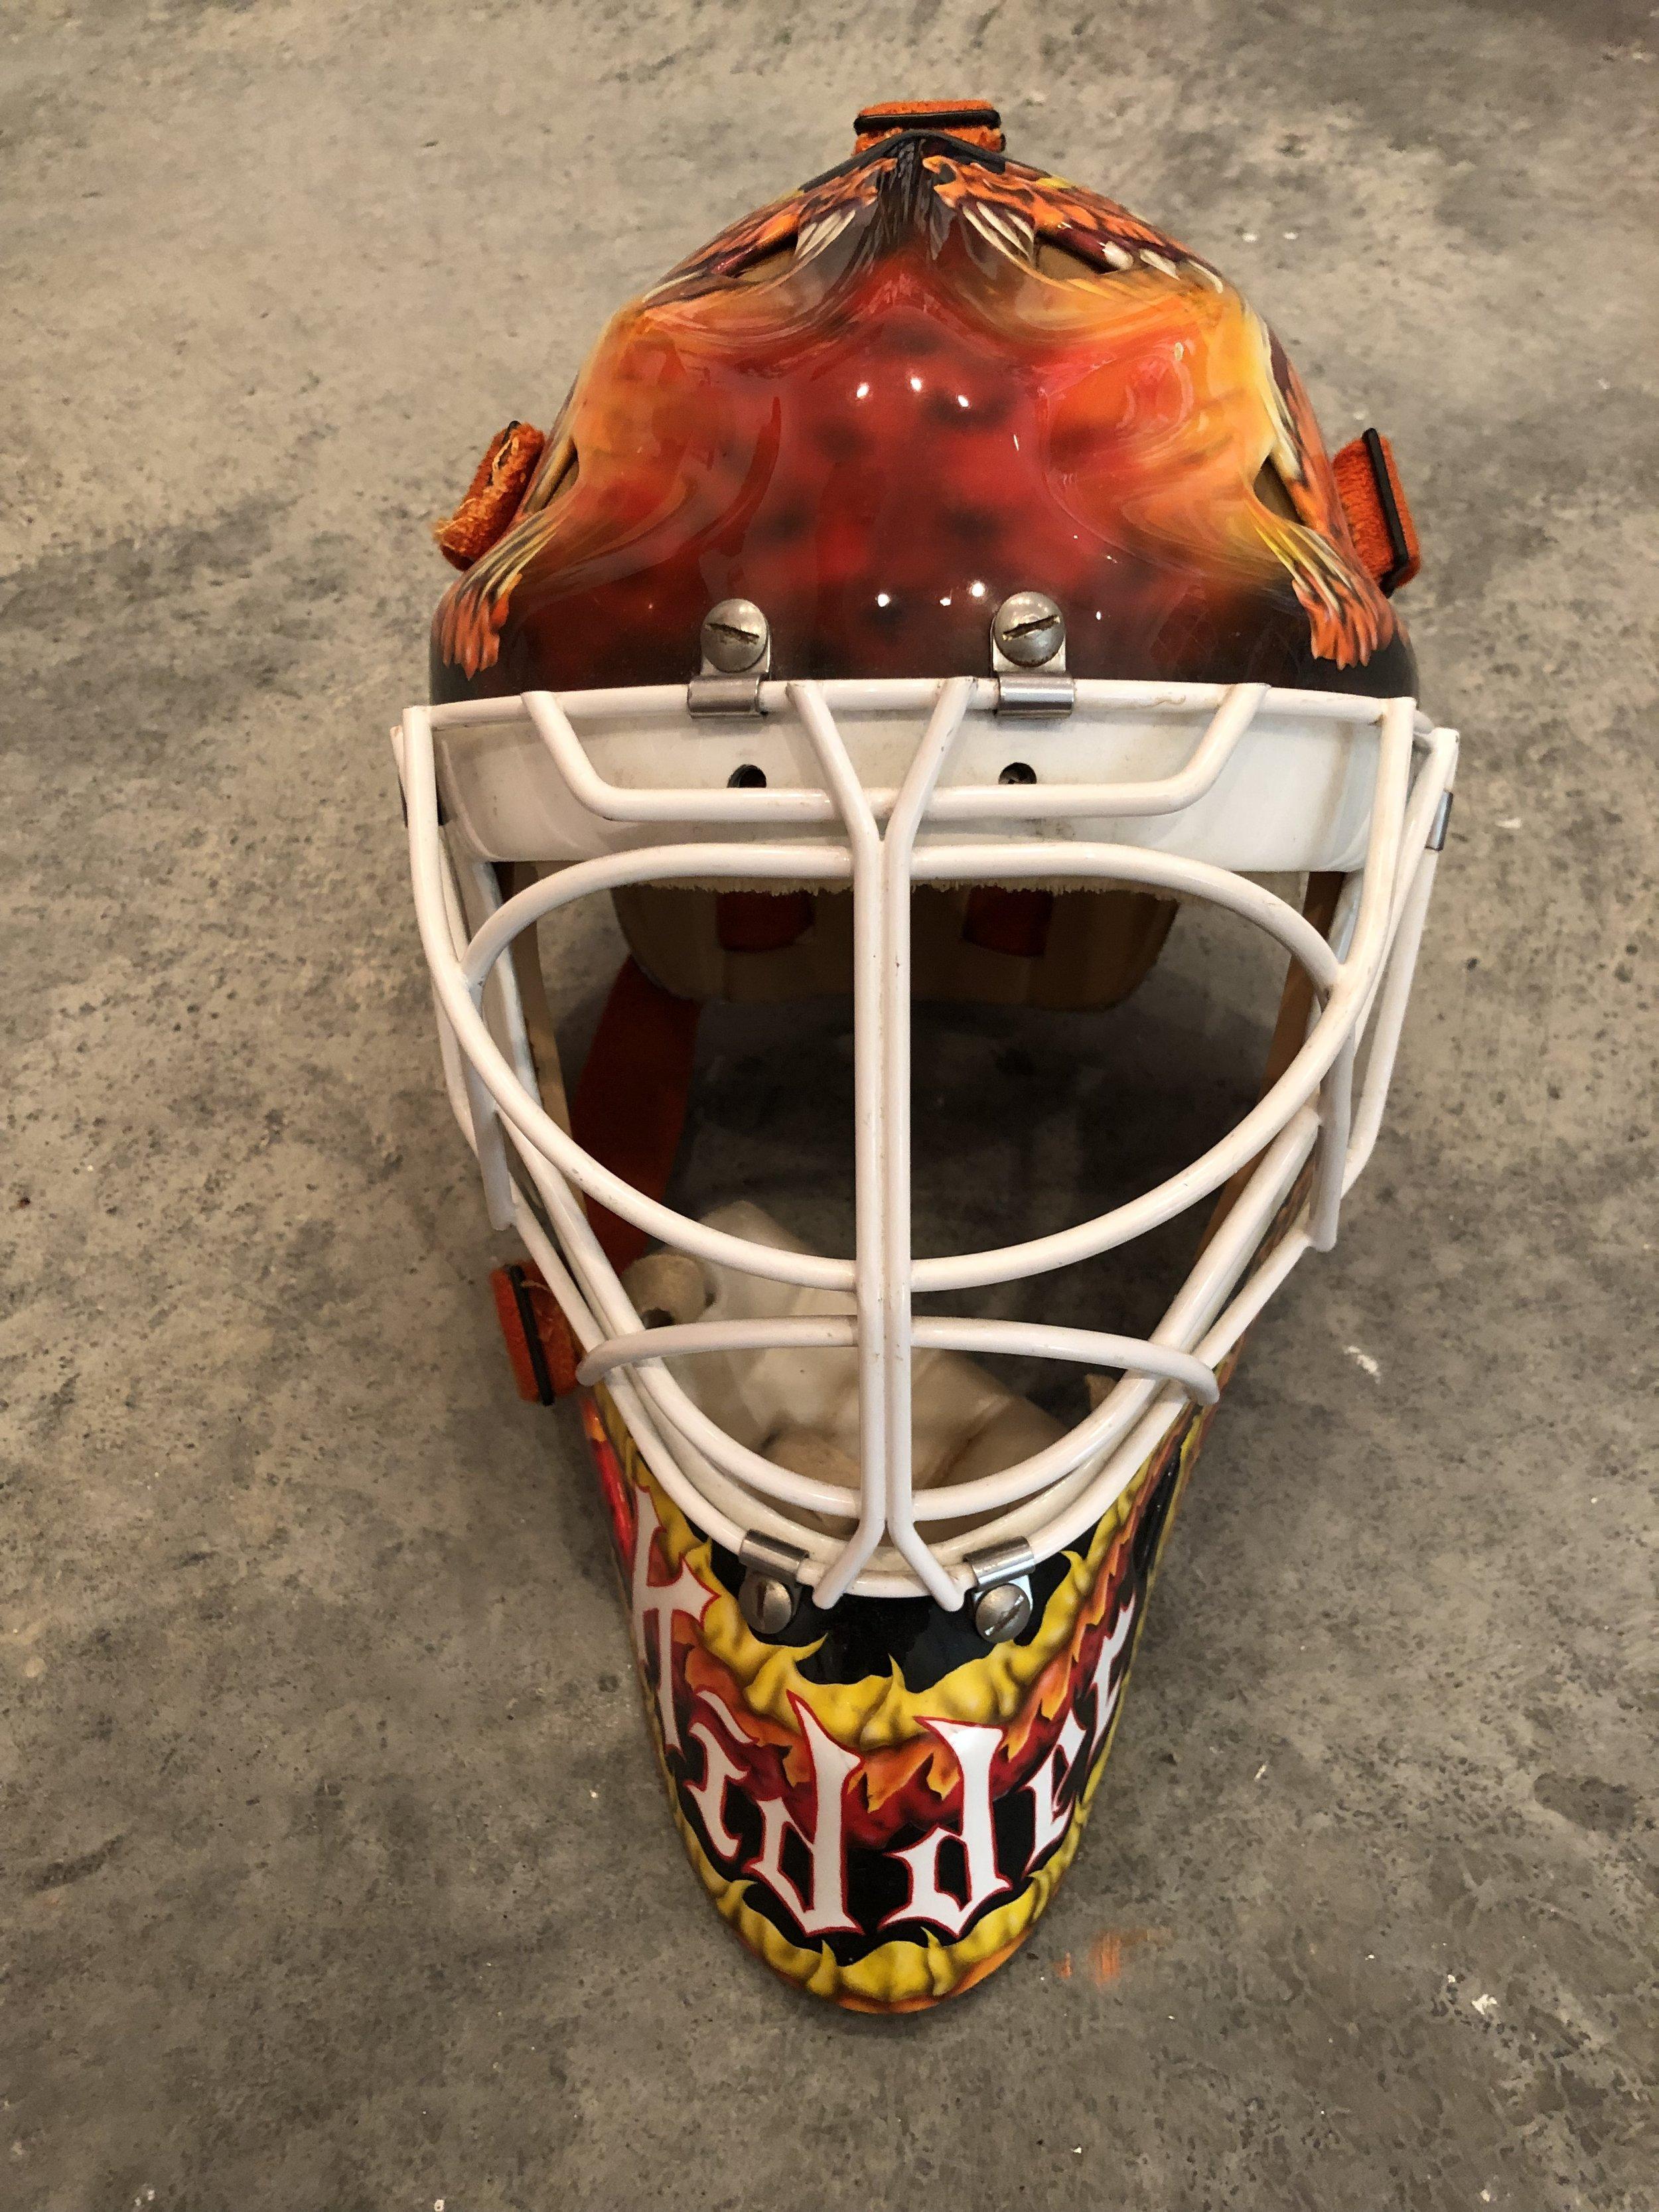 1995-96 Trevor Kidd Calgary Flames game worn mask